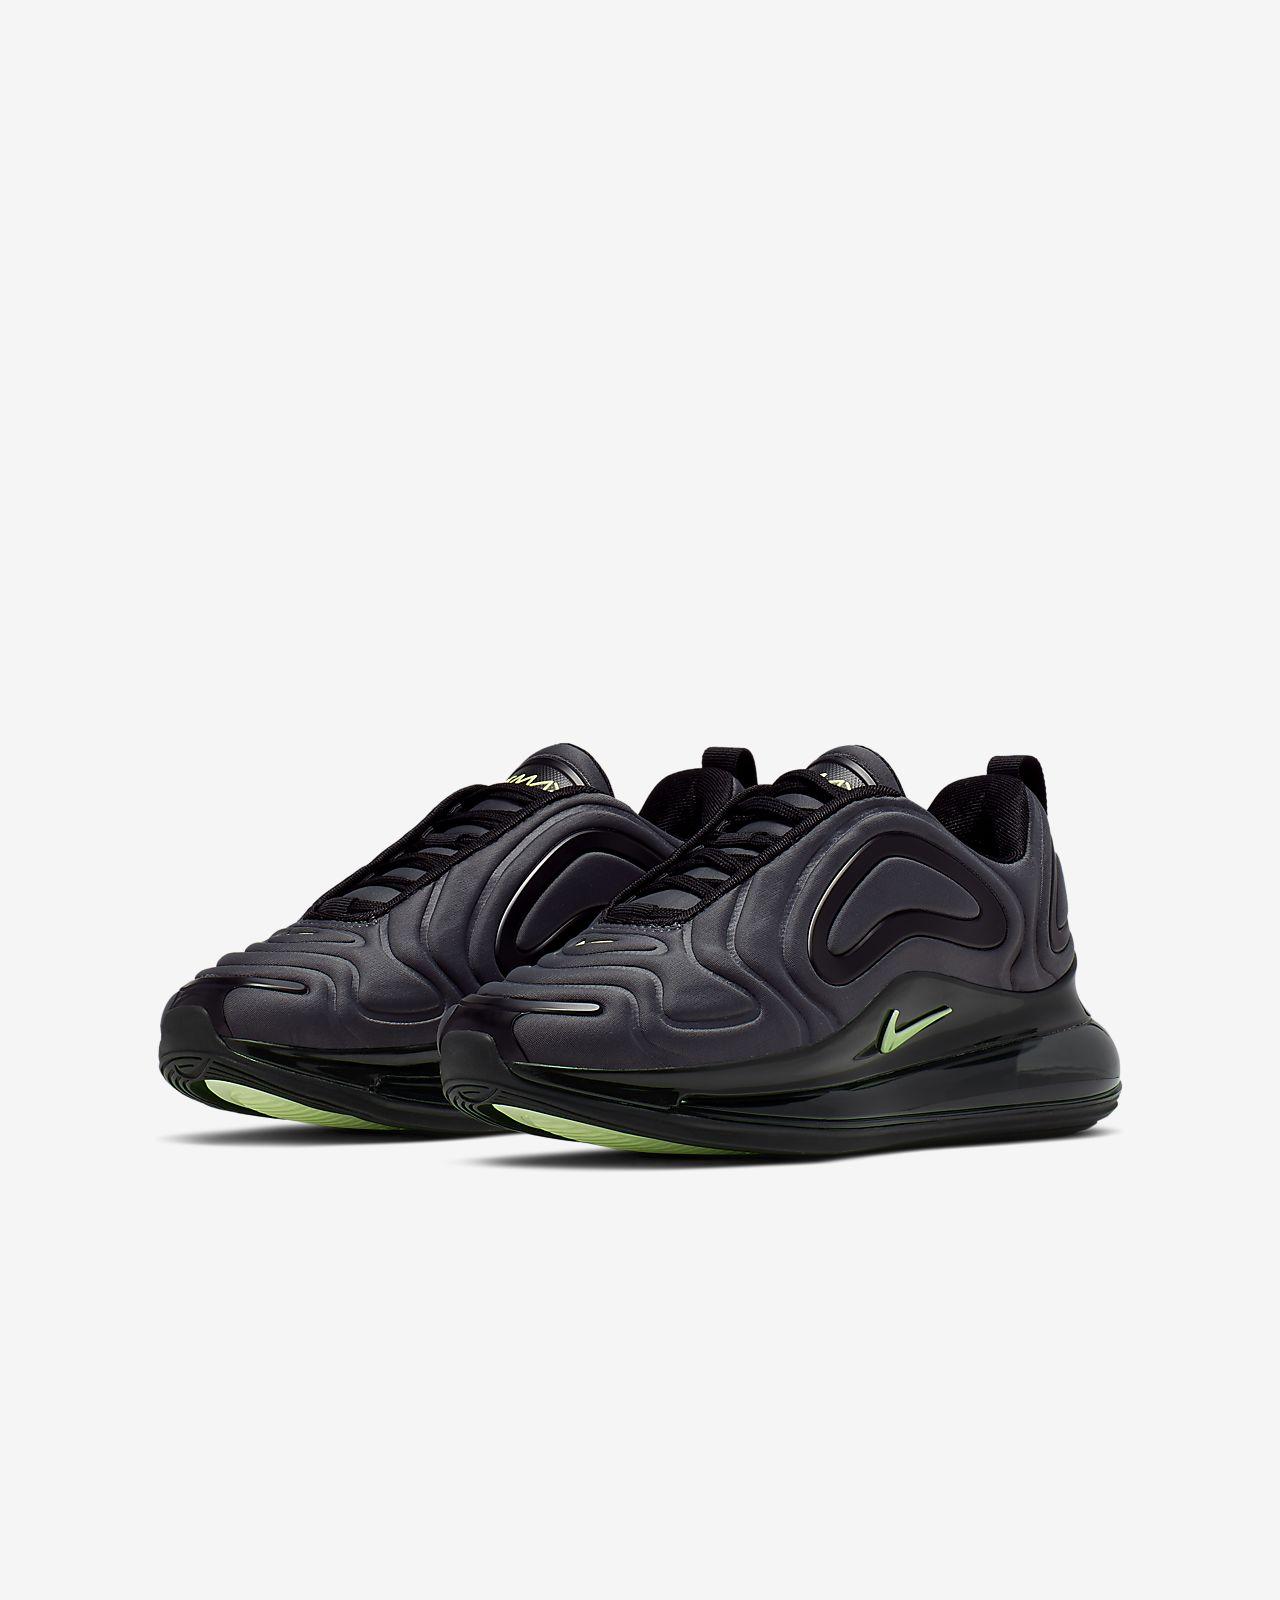 Nike Air Max 720 sko til småstore barn